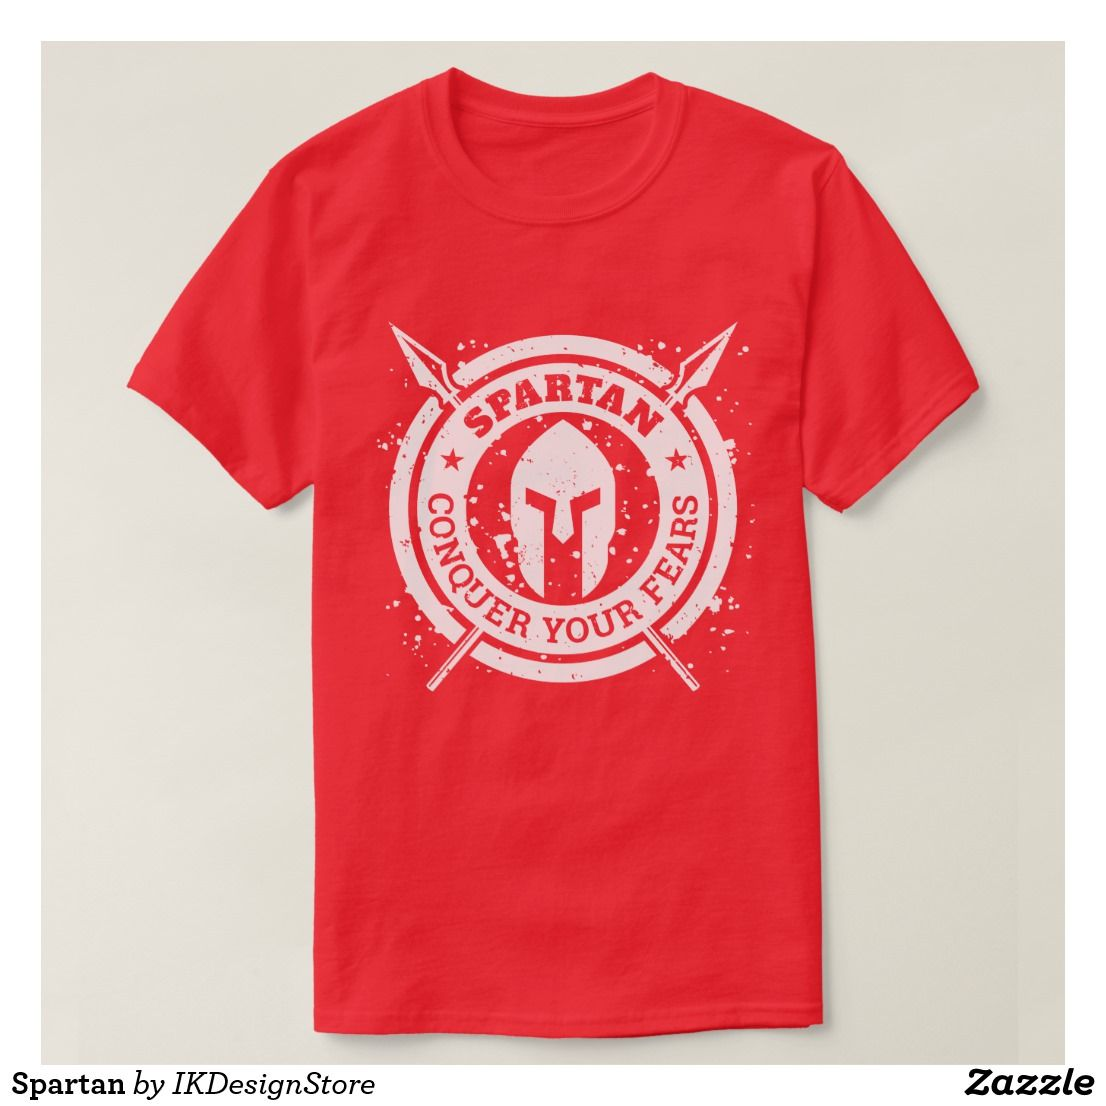 spartan maglietta  Spartan T-Shirt   Highlights   Shirts, T shirt, Highlights